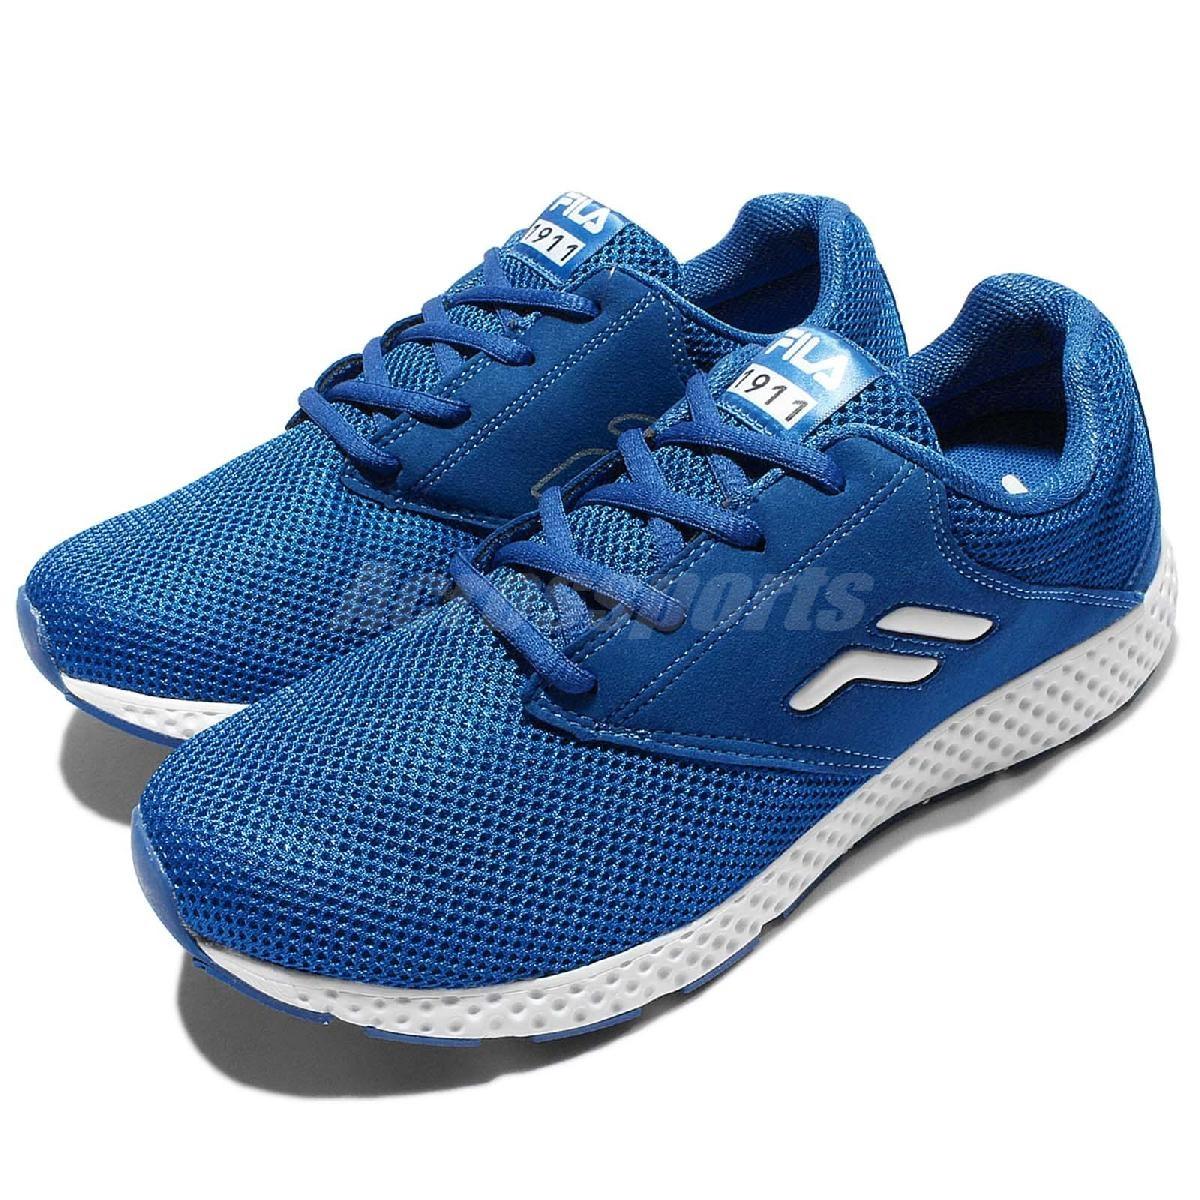 FILA 慢跑鞋 J311Q 藍白 基本款 路跑 男鞋【PUMP306】 1J311Q331